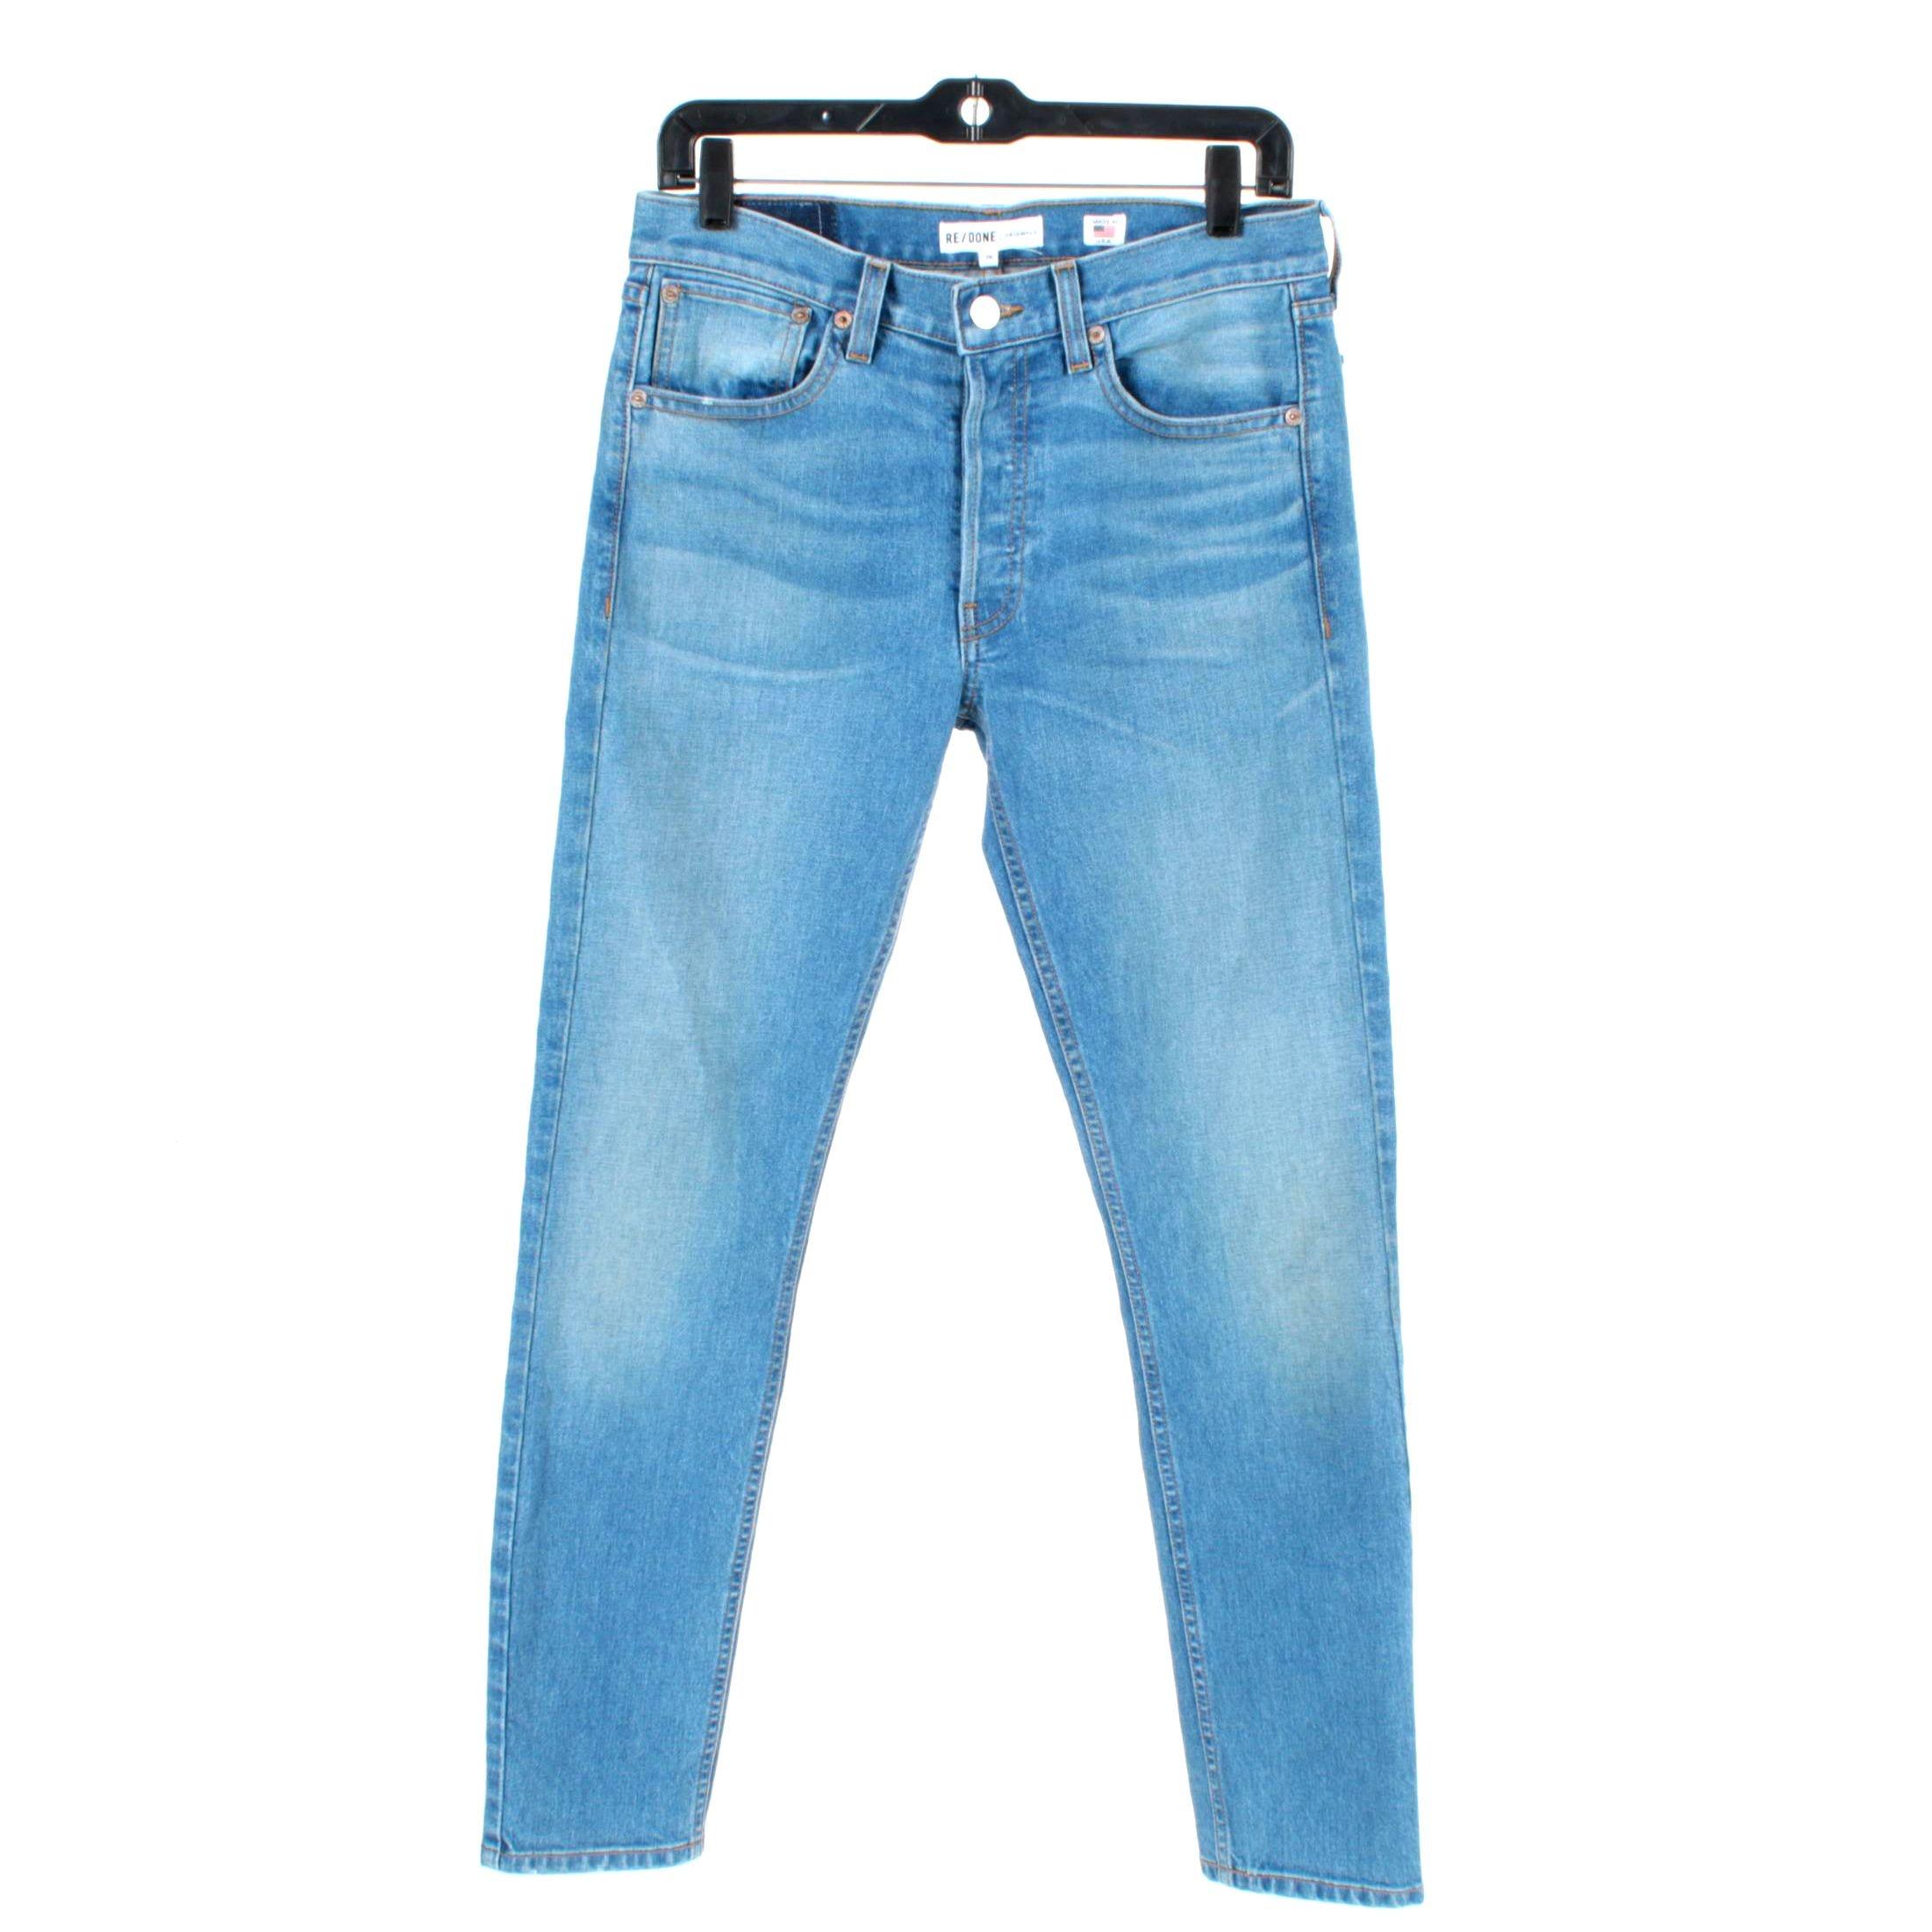 Women's Re/Done Originals Jeans